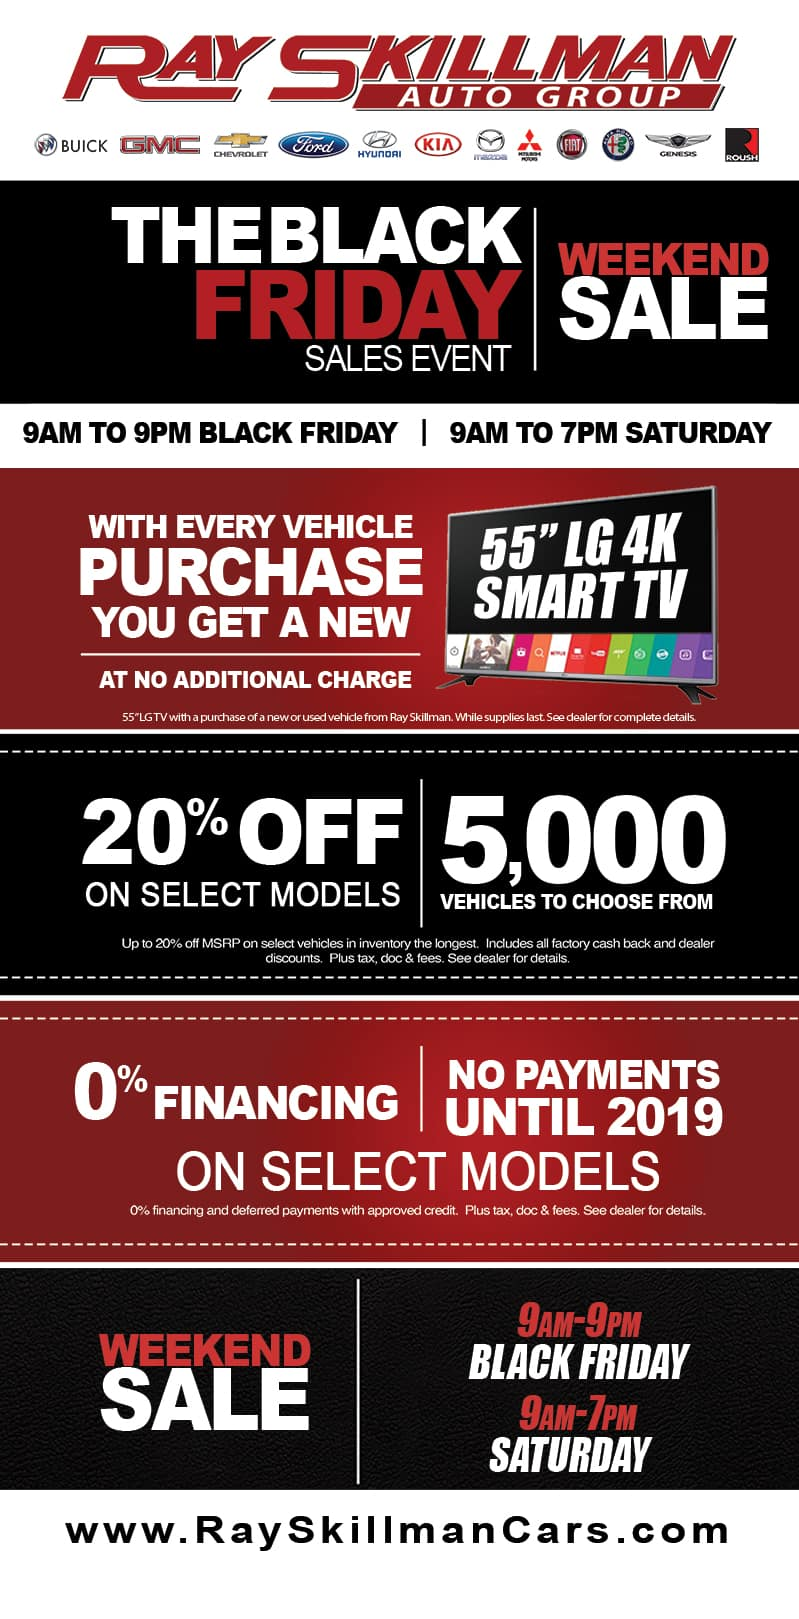 Black Friday Ray Skillman Auto Group Indianapolis In